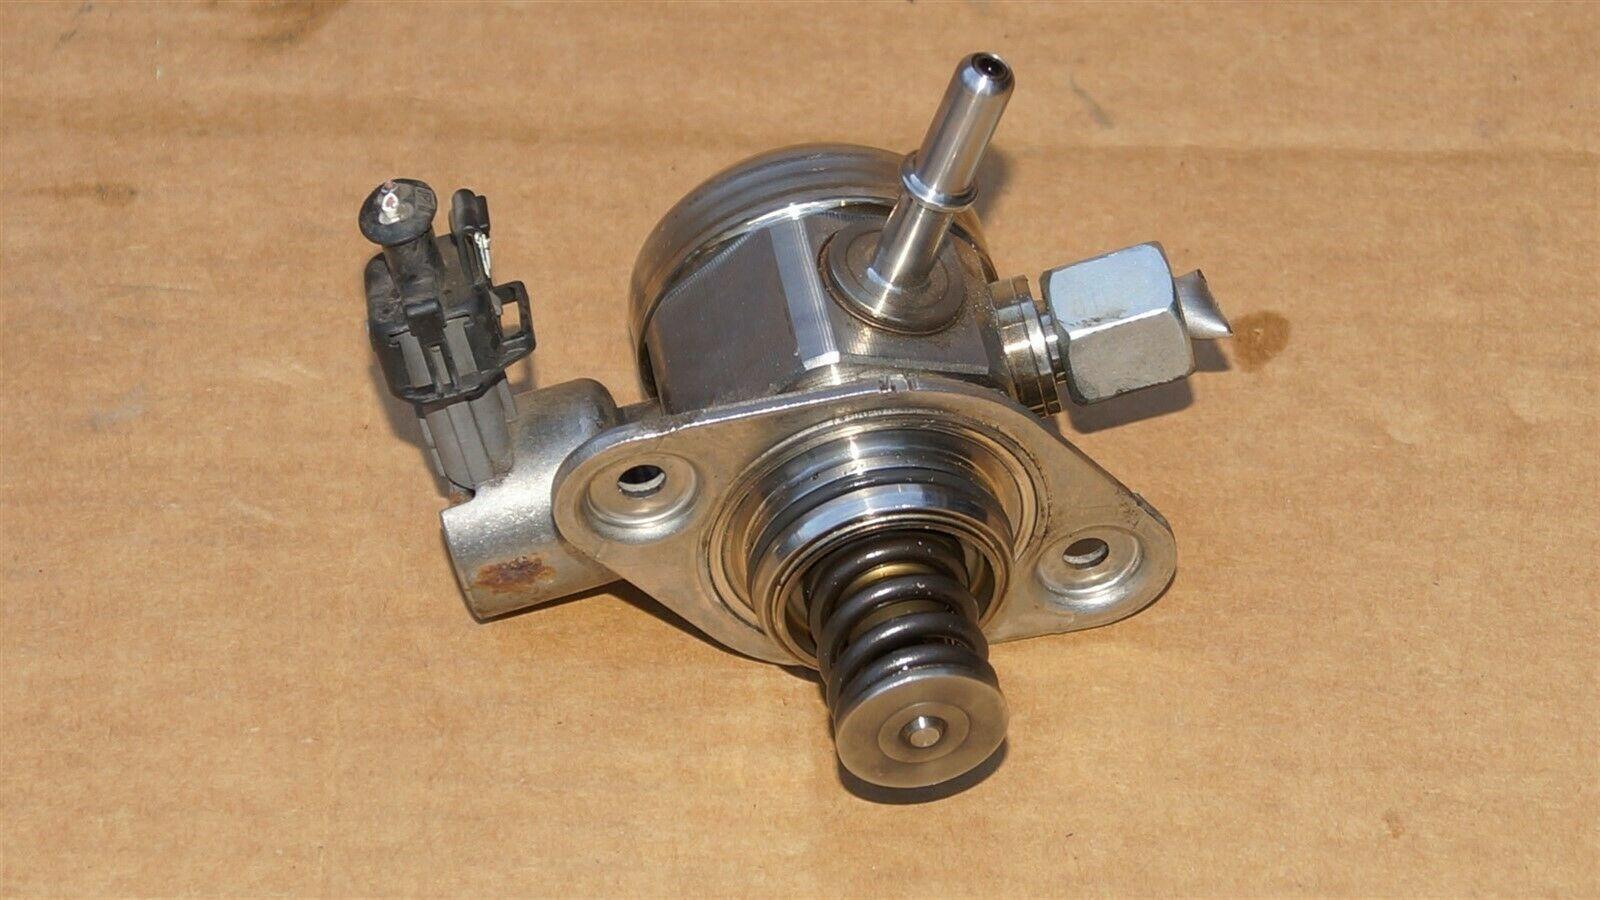 KIA Hyundai GDI Gas Direct Injection High Pressure Fuel Pump HPFP 35320-2G730